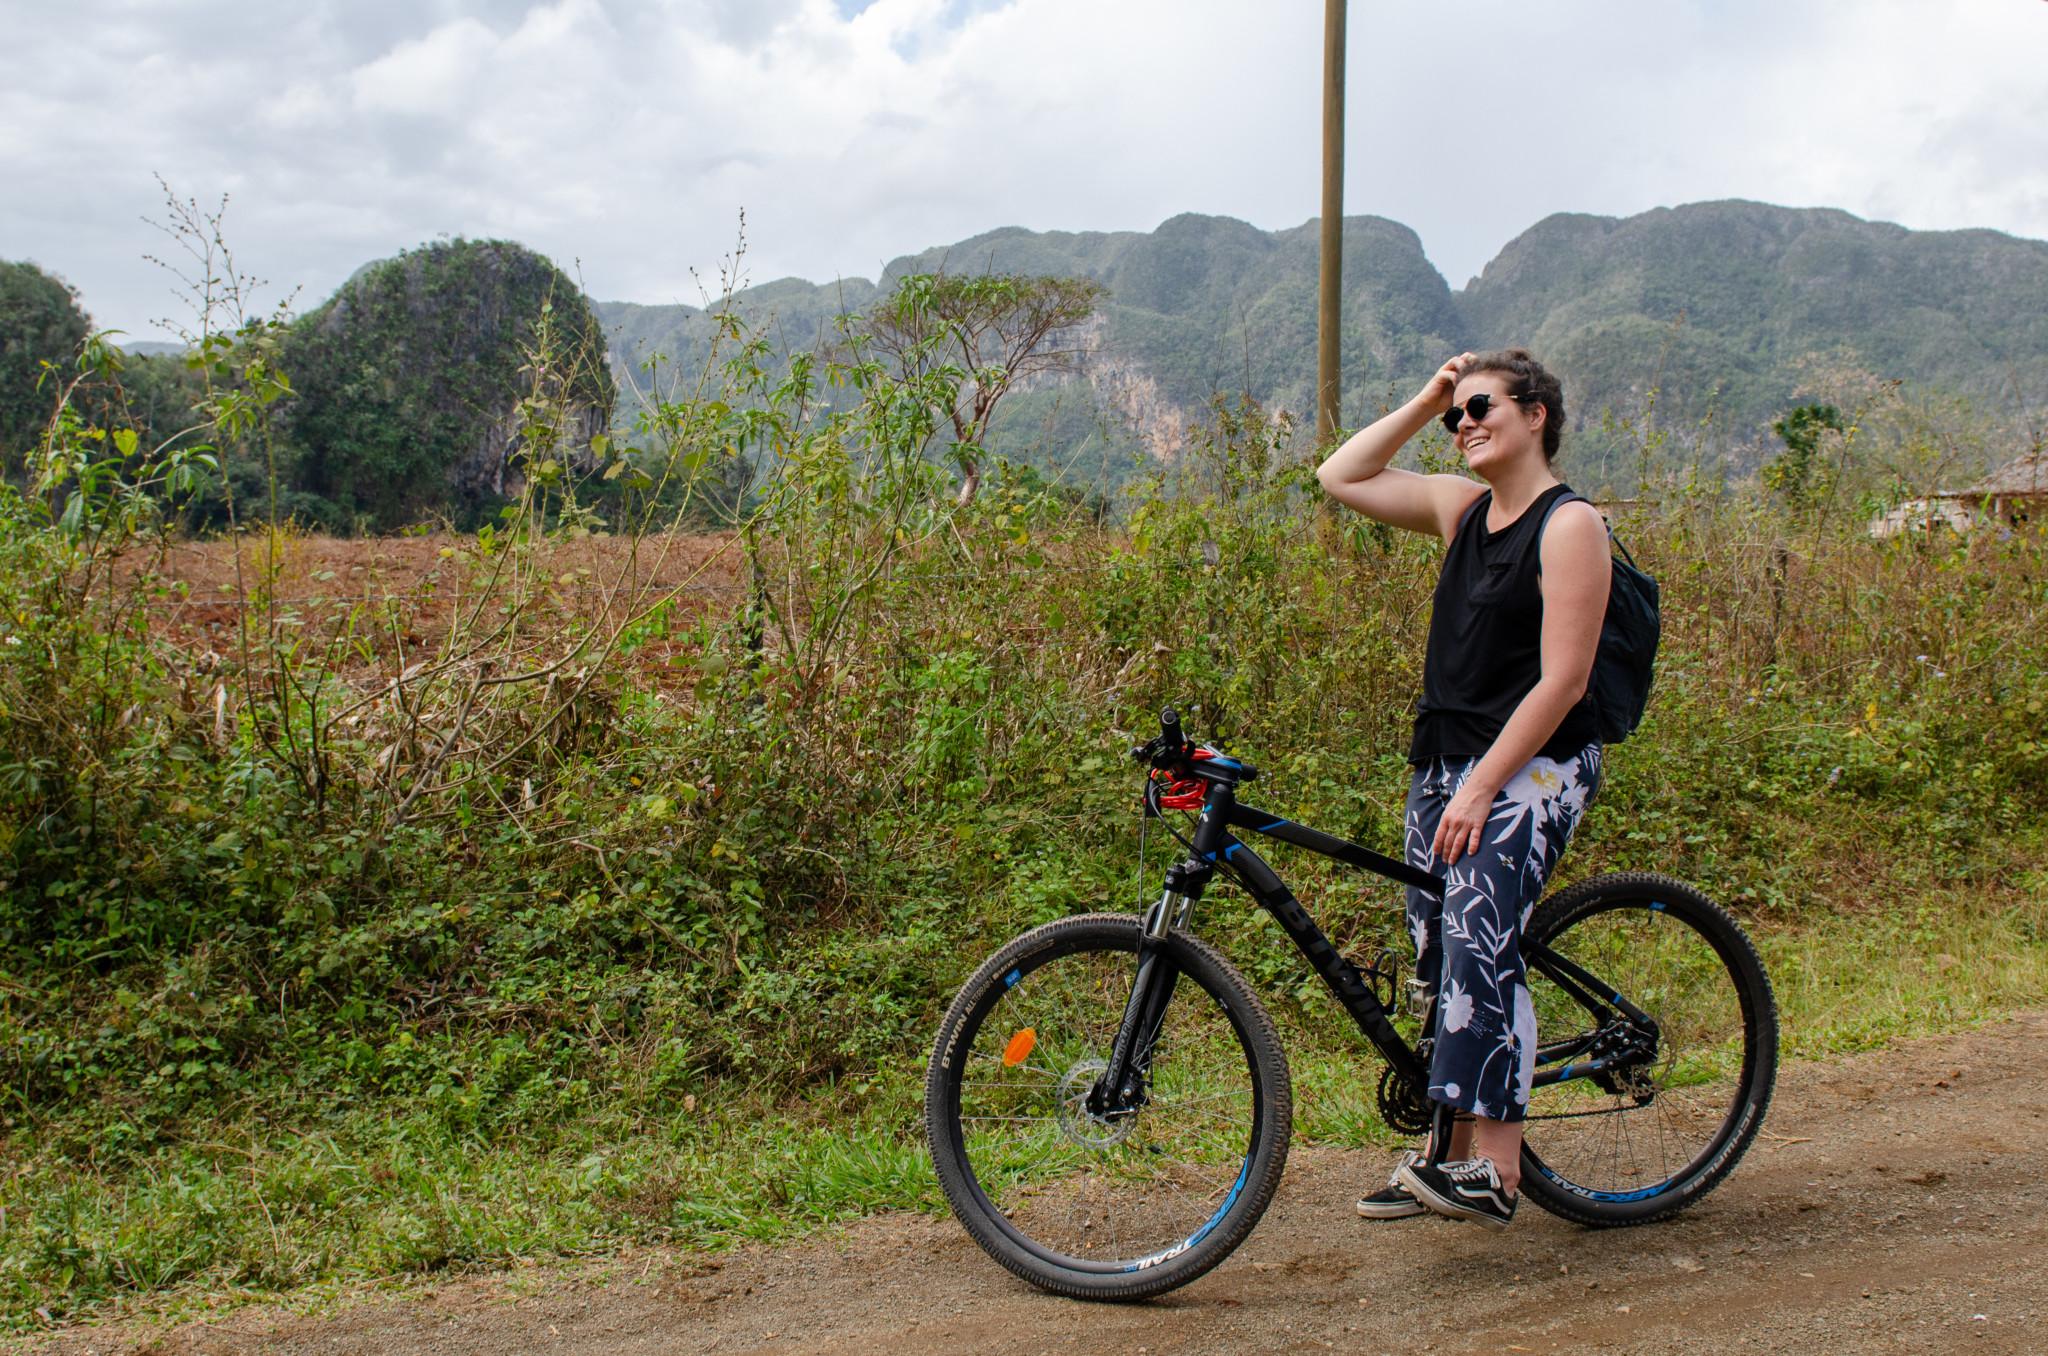 Radtour durch das Valle de Vinales